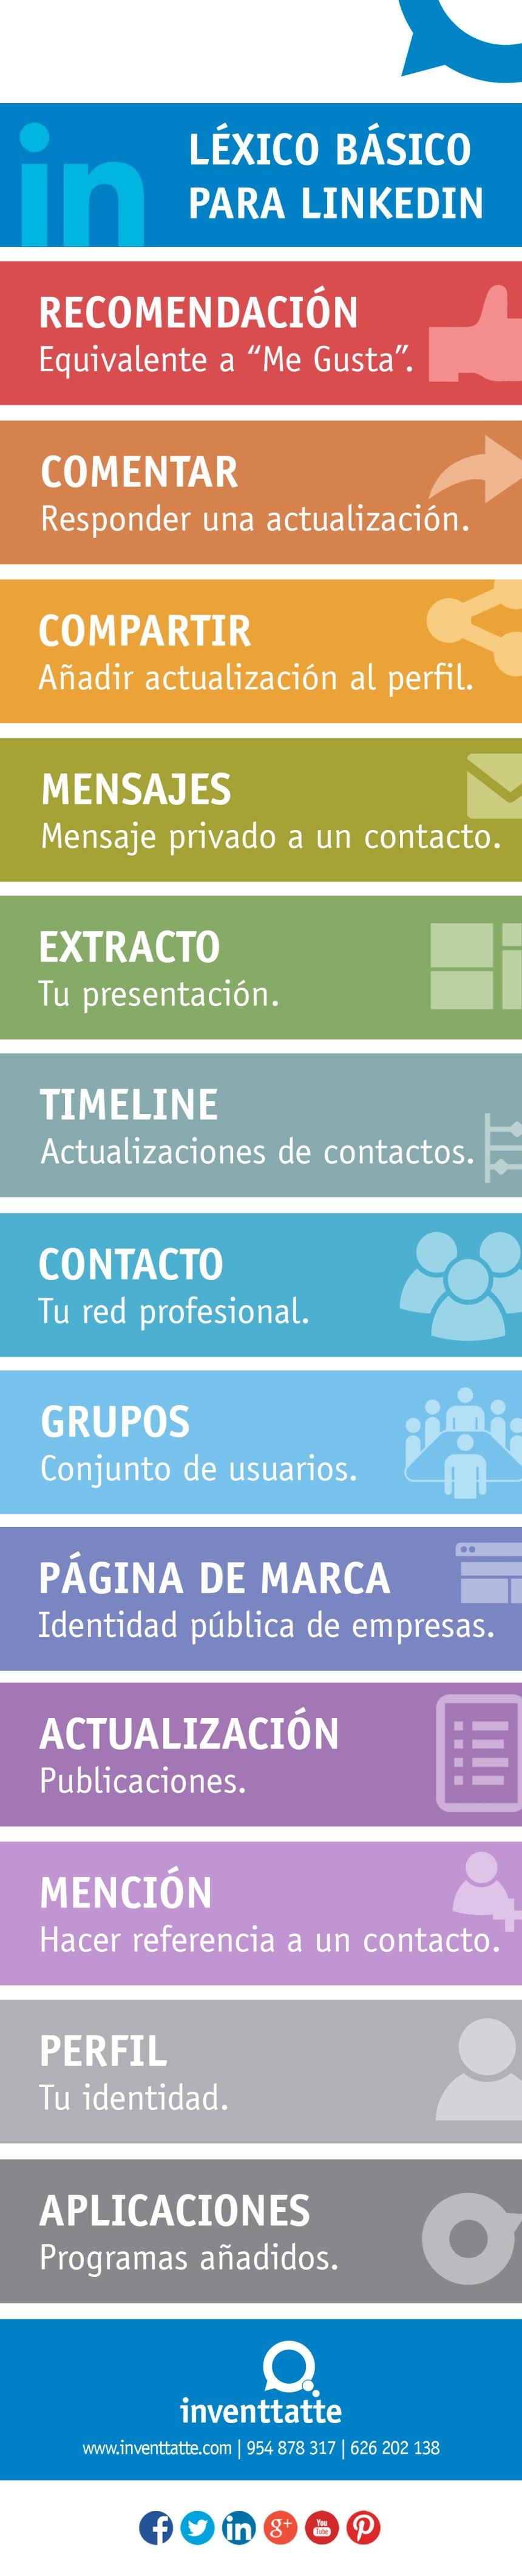 Léxico básico para LinkedIn